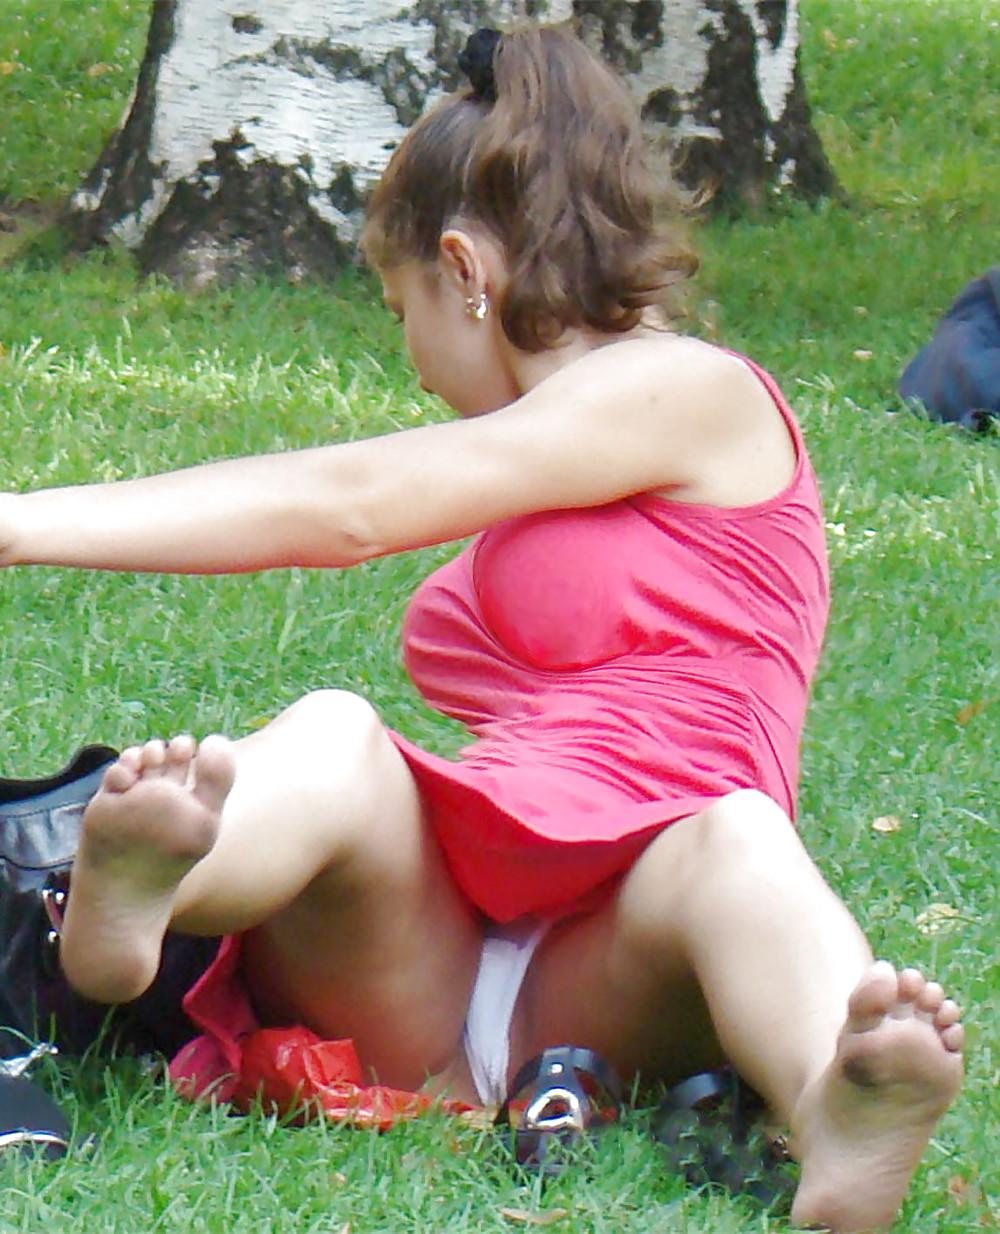 image Denise masino pantyhose home video female bodybuilder